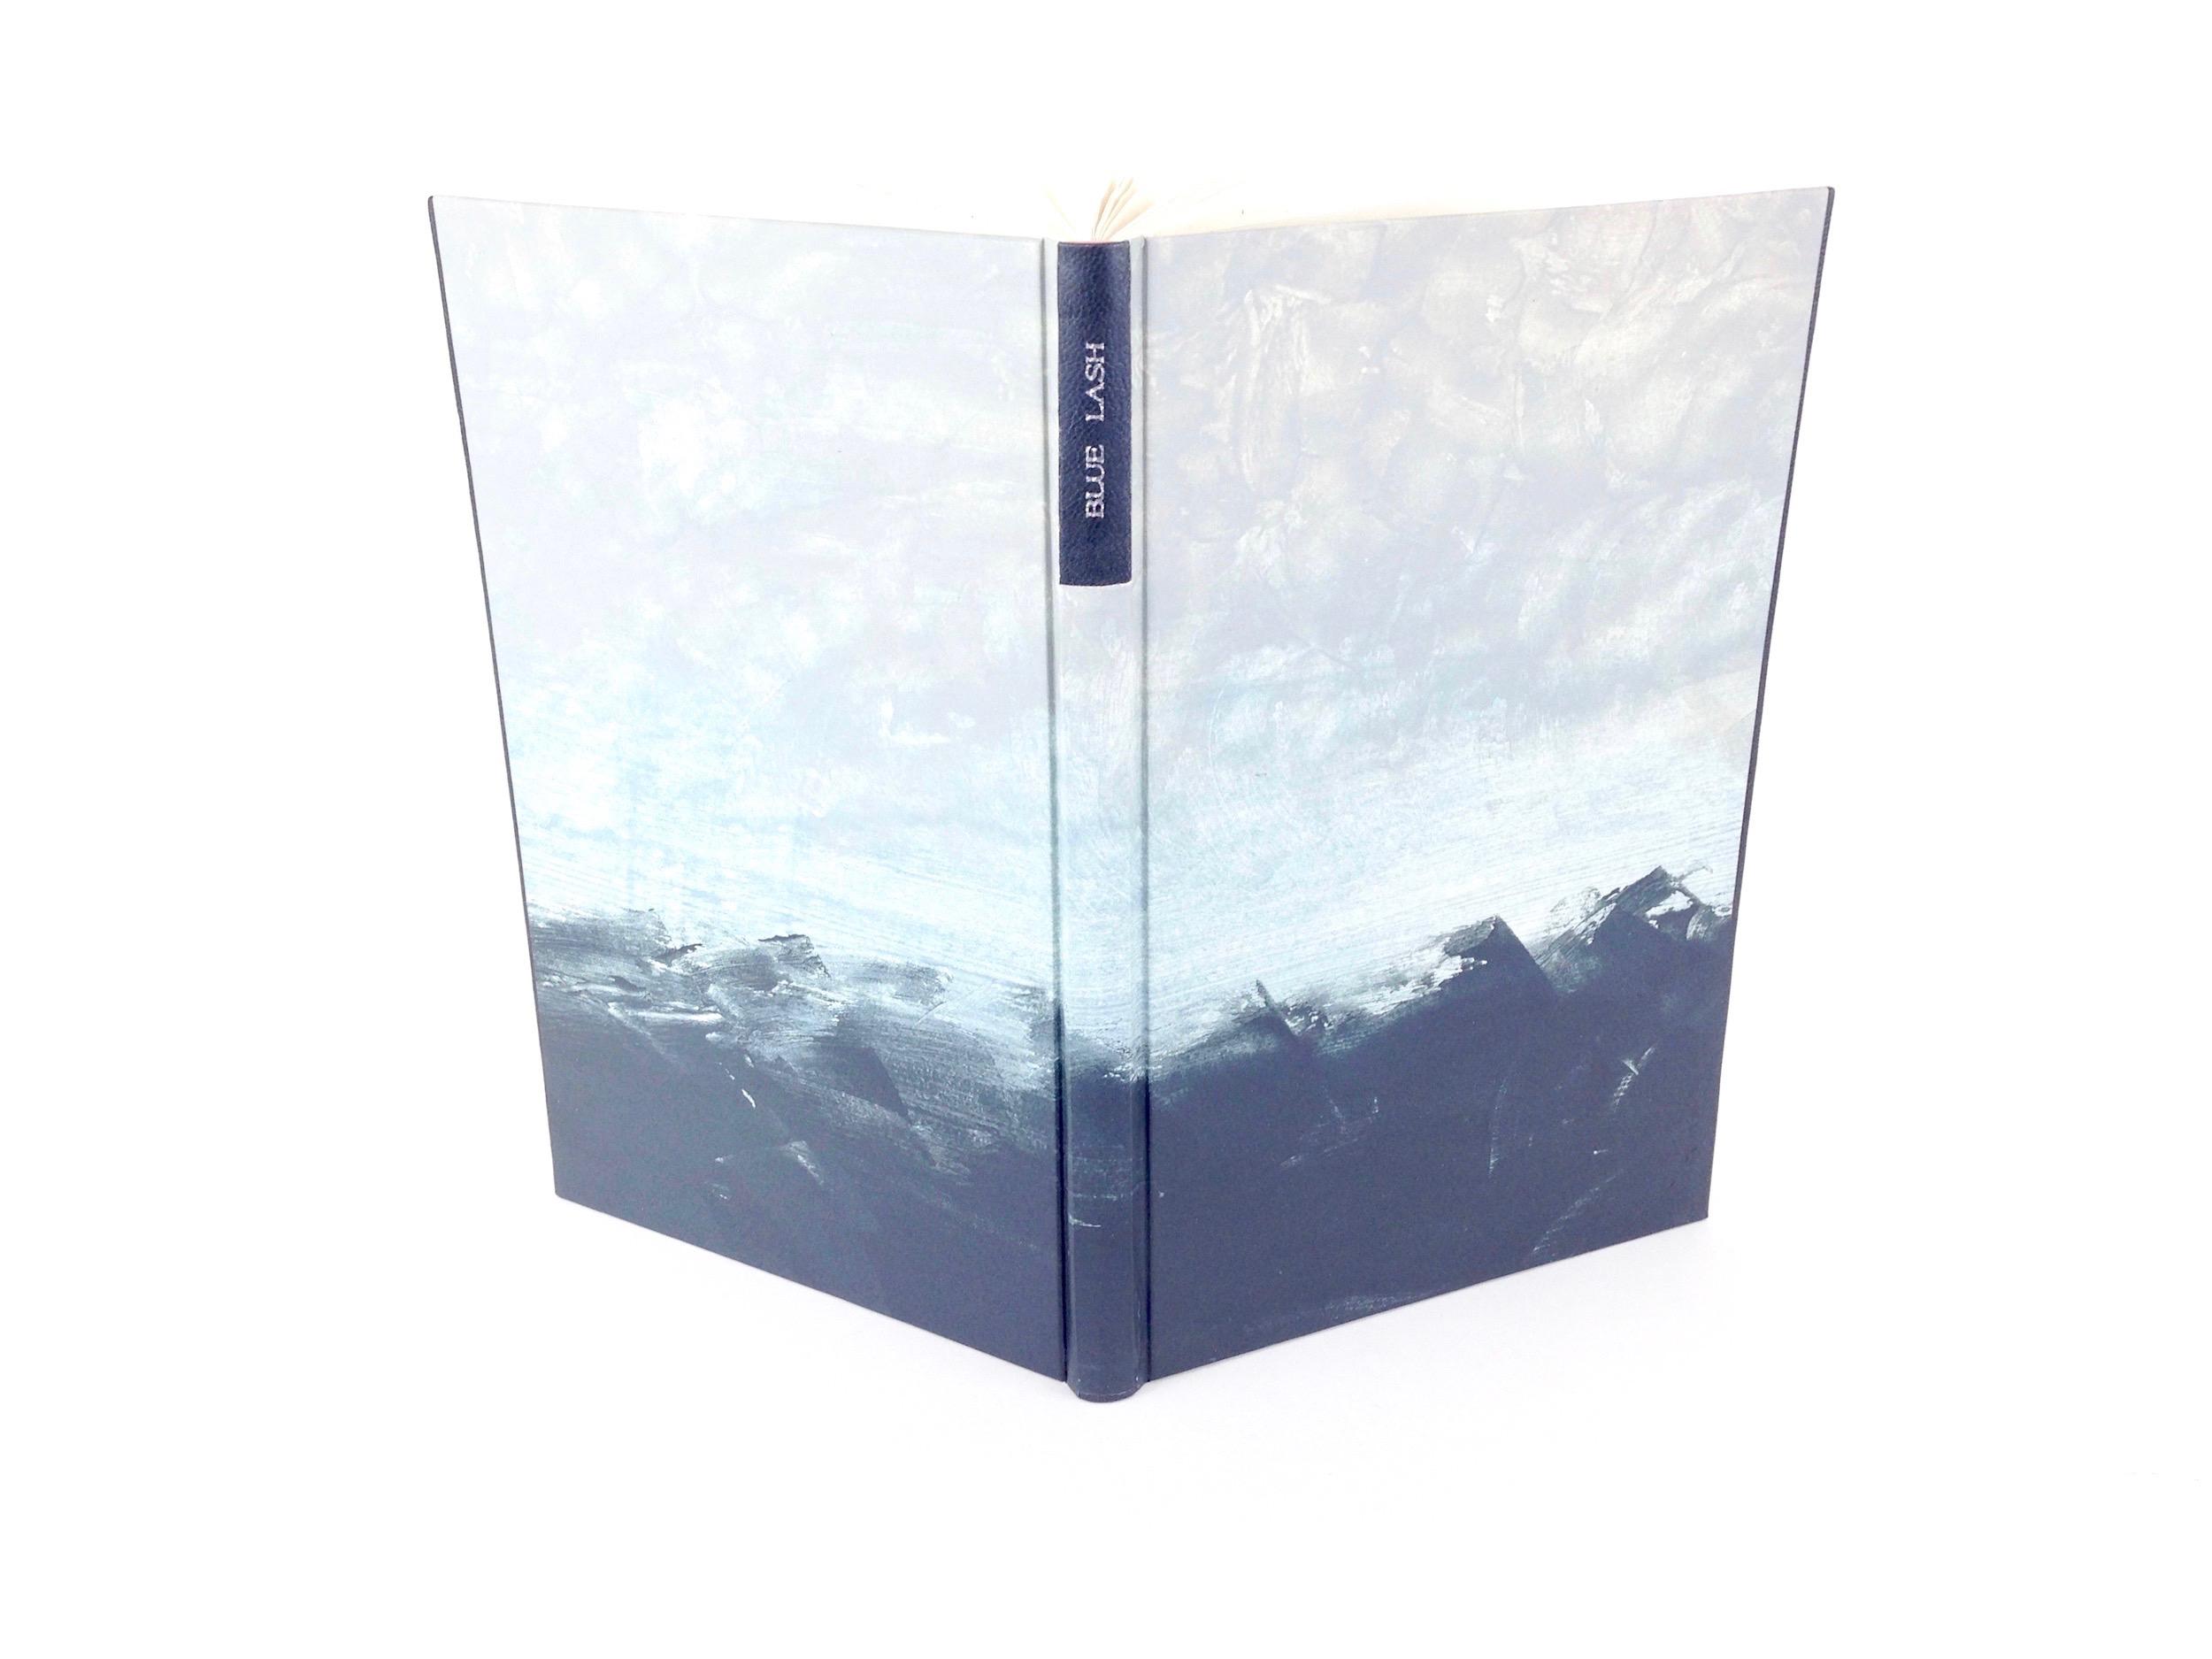 Design Binding—Blue Lash by Jim Armstrong, 2006